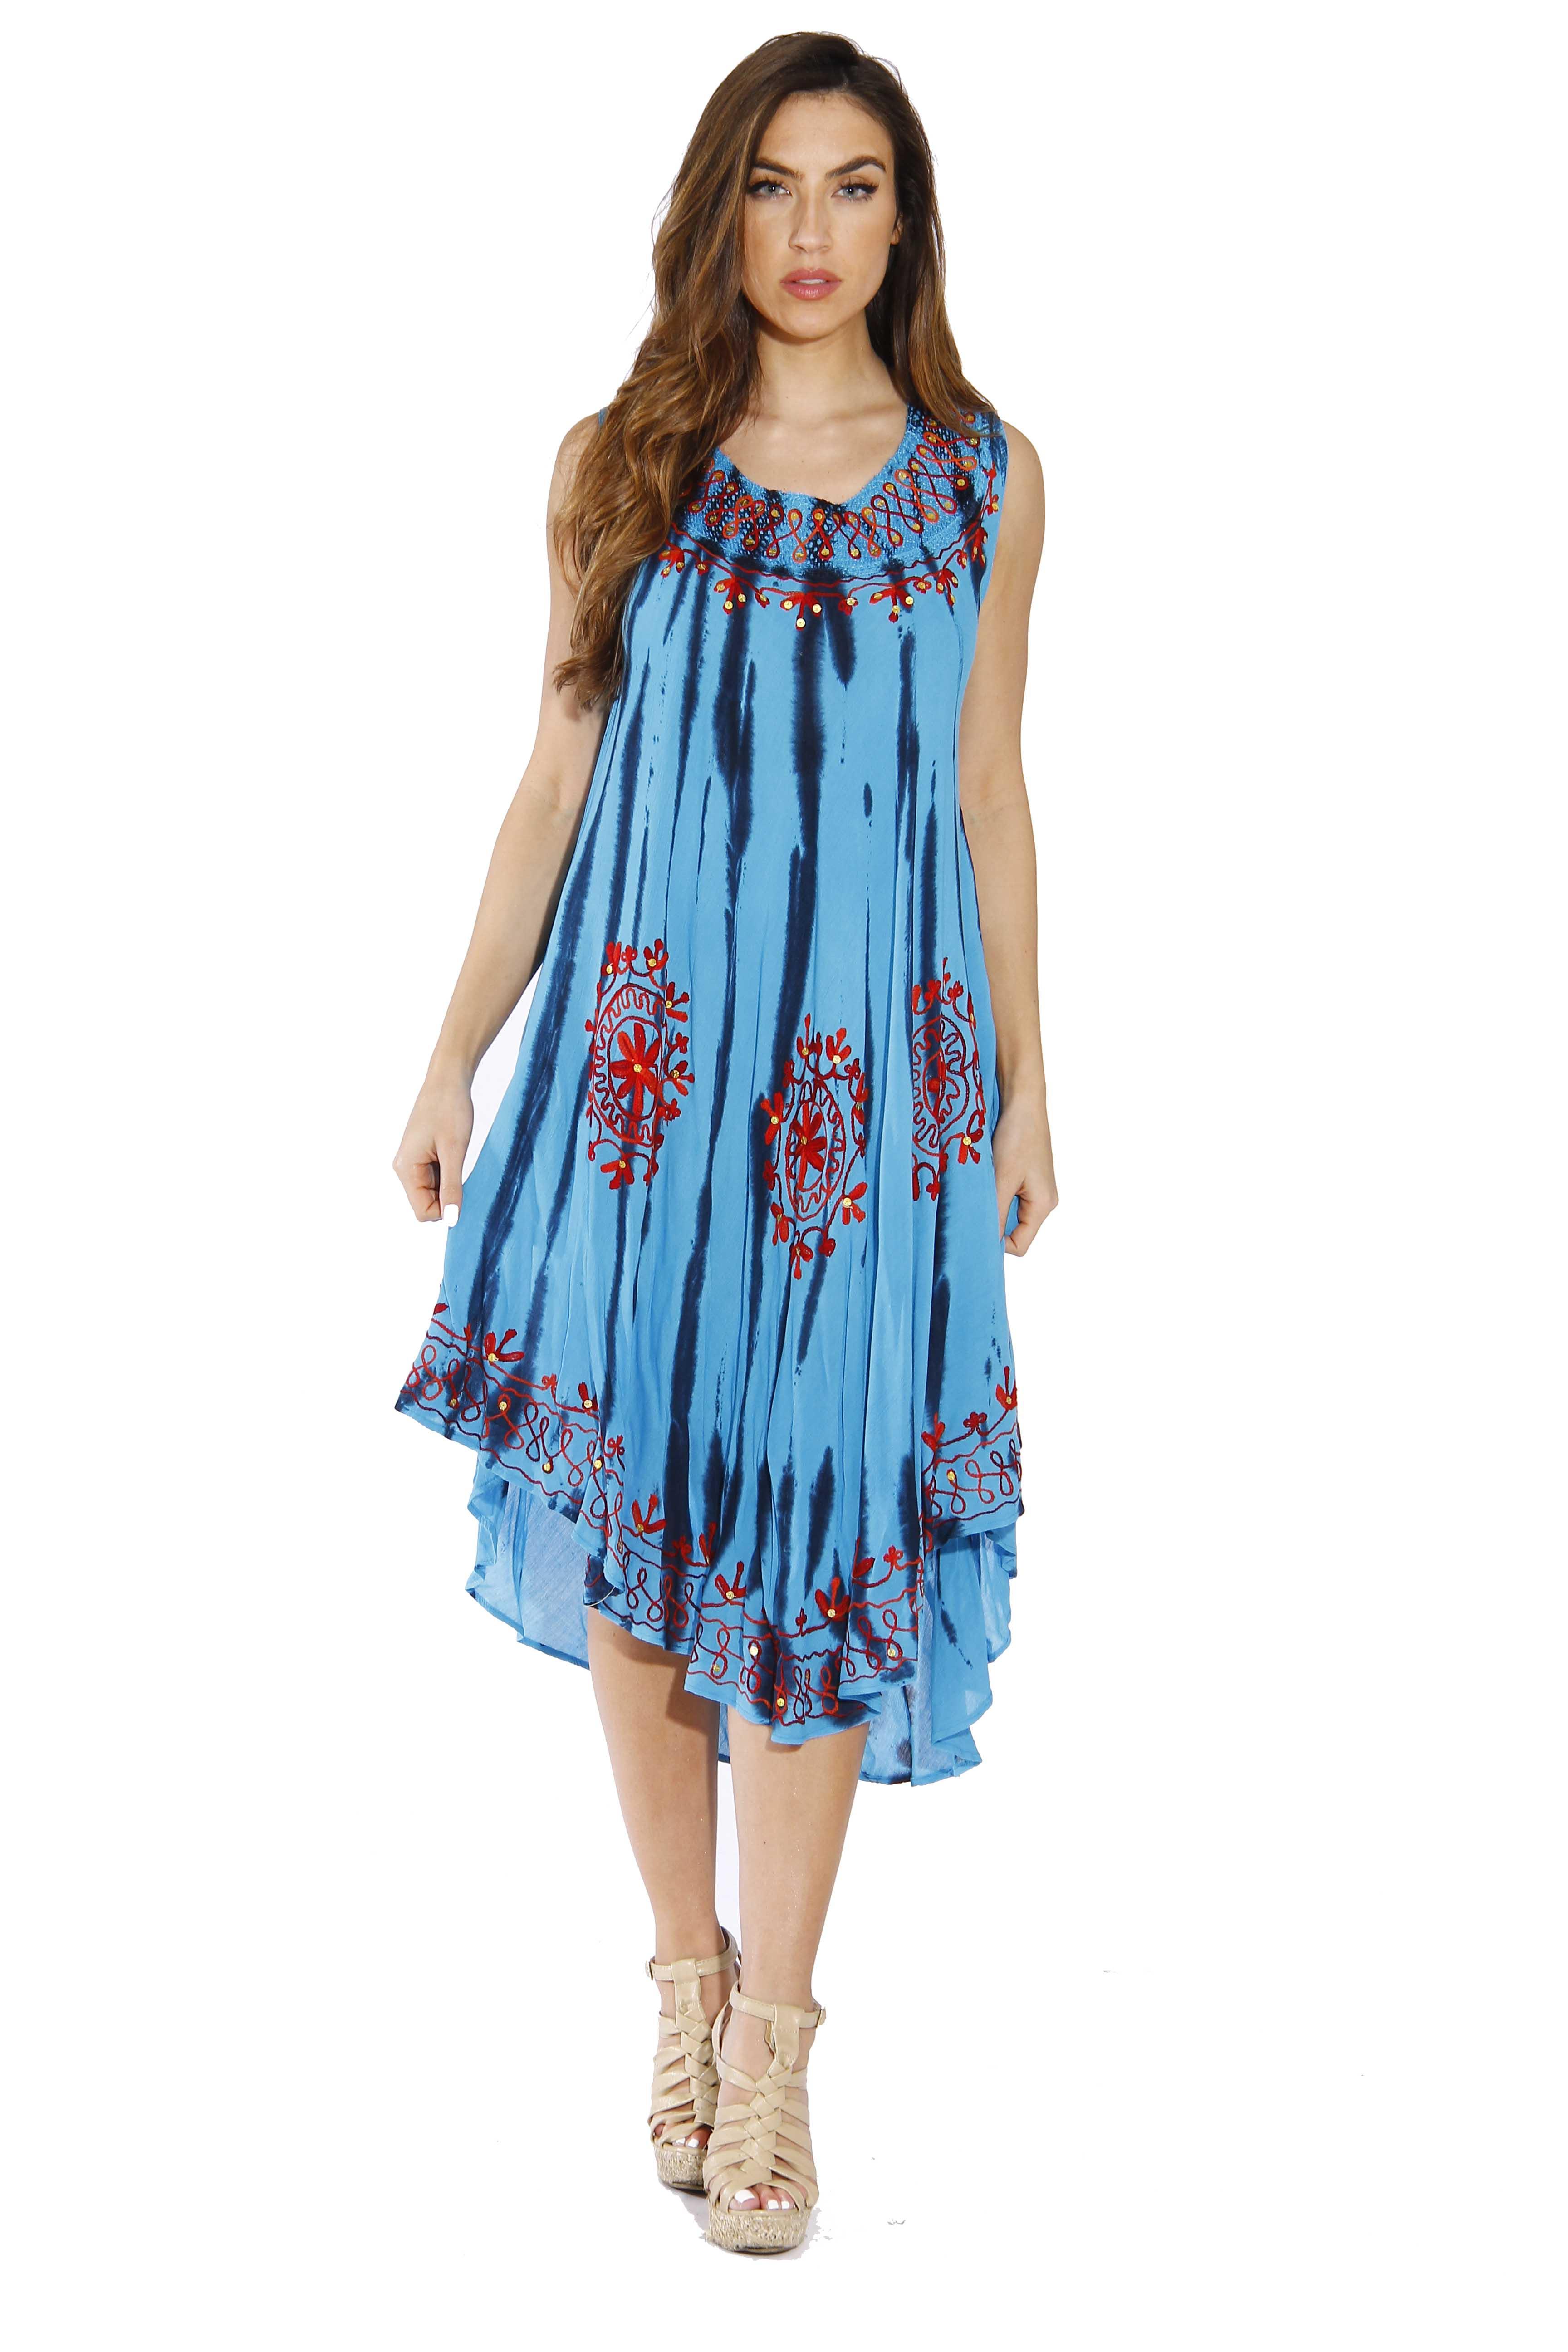 plus size sun dresses riviera-sun-american-flag-dress-plus-size-summer- pctawam